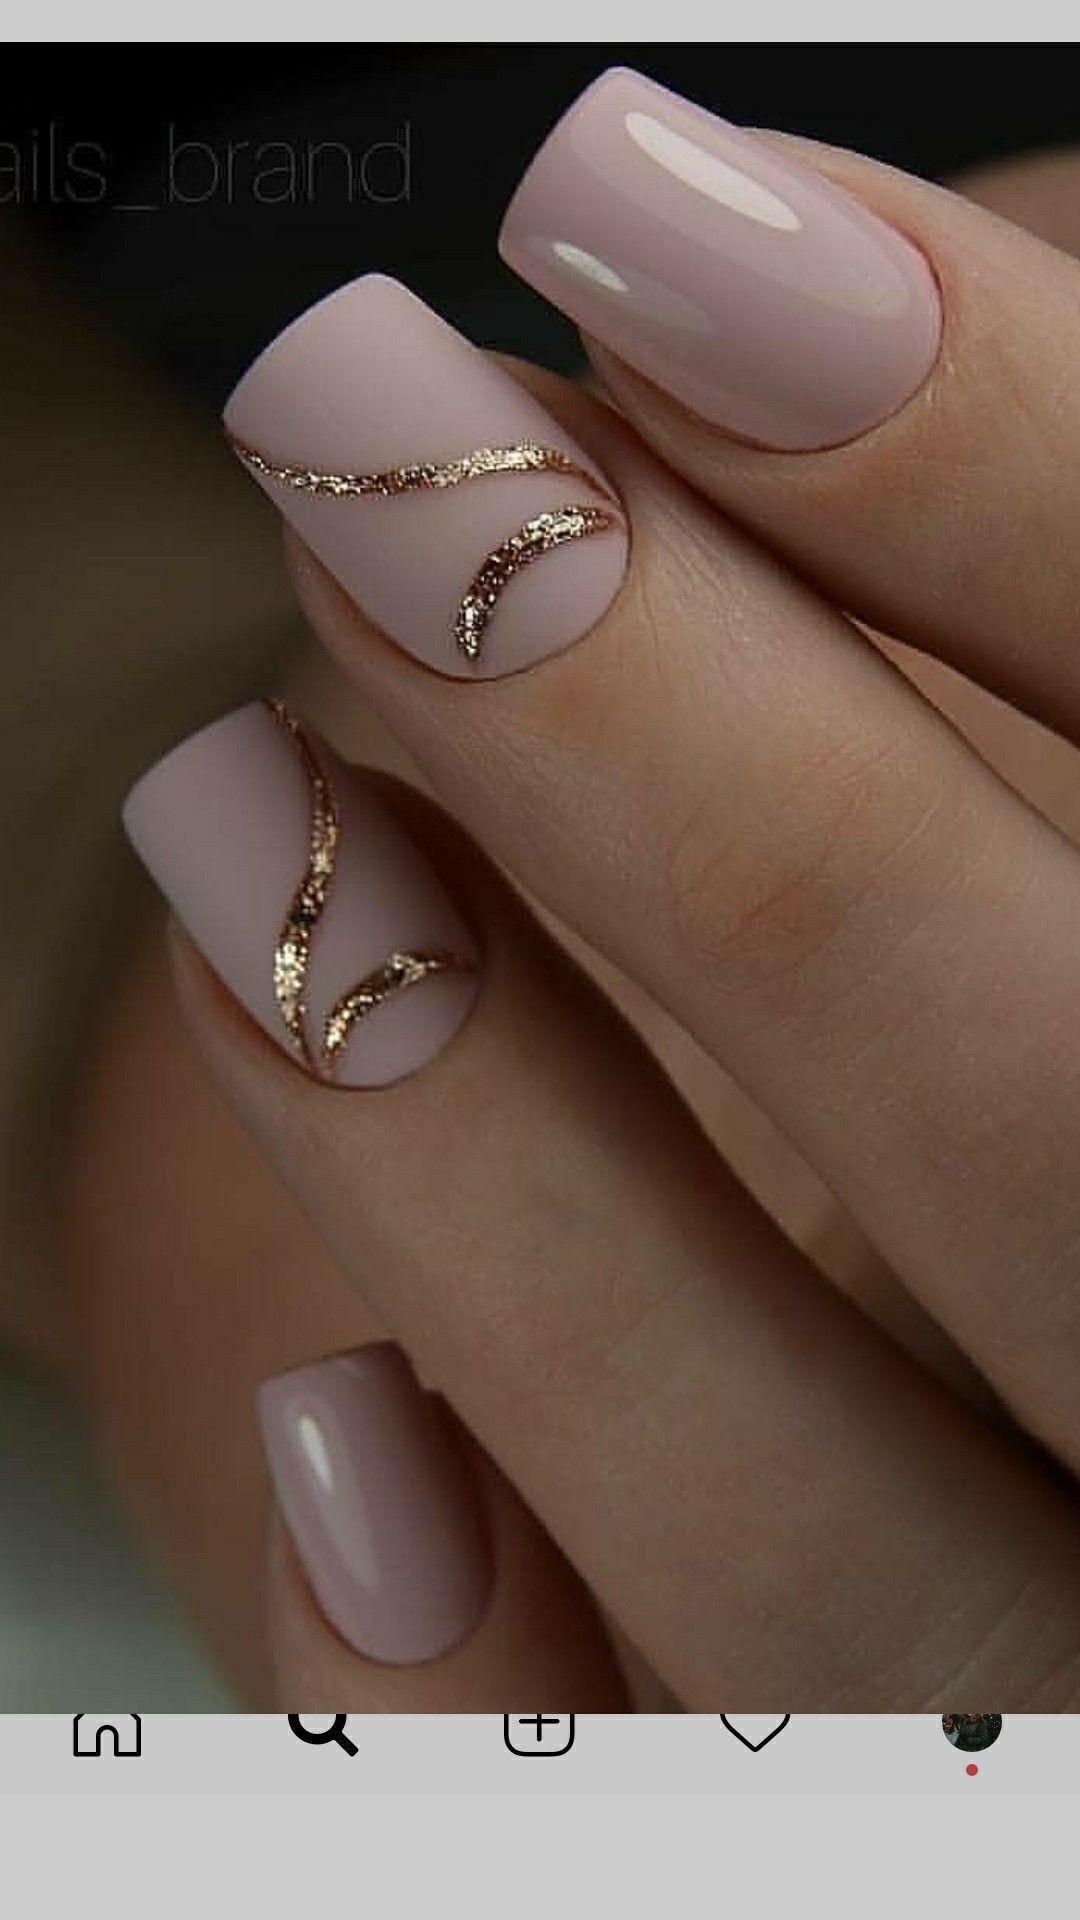 (notitle) - Mani - #Mani #notitle #decoracion de uñas cortas